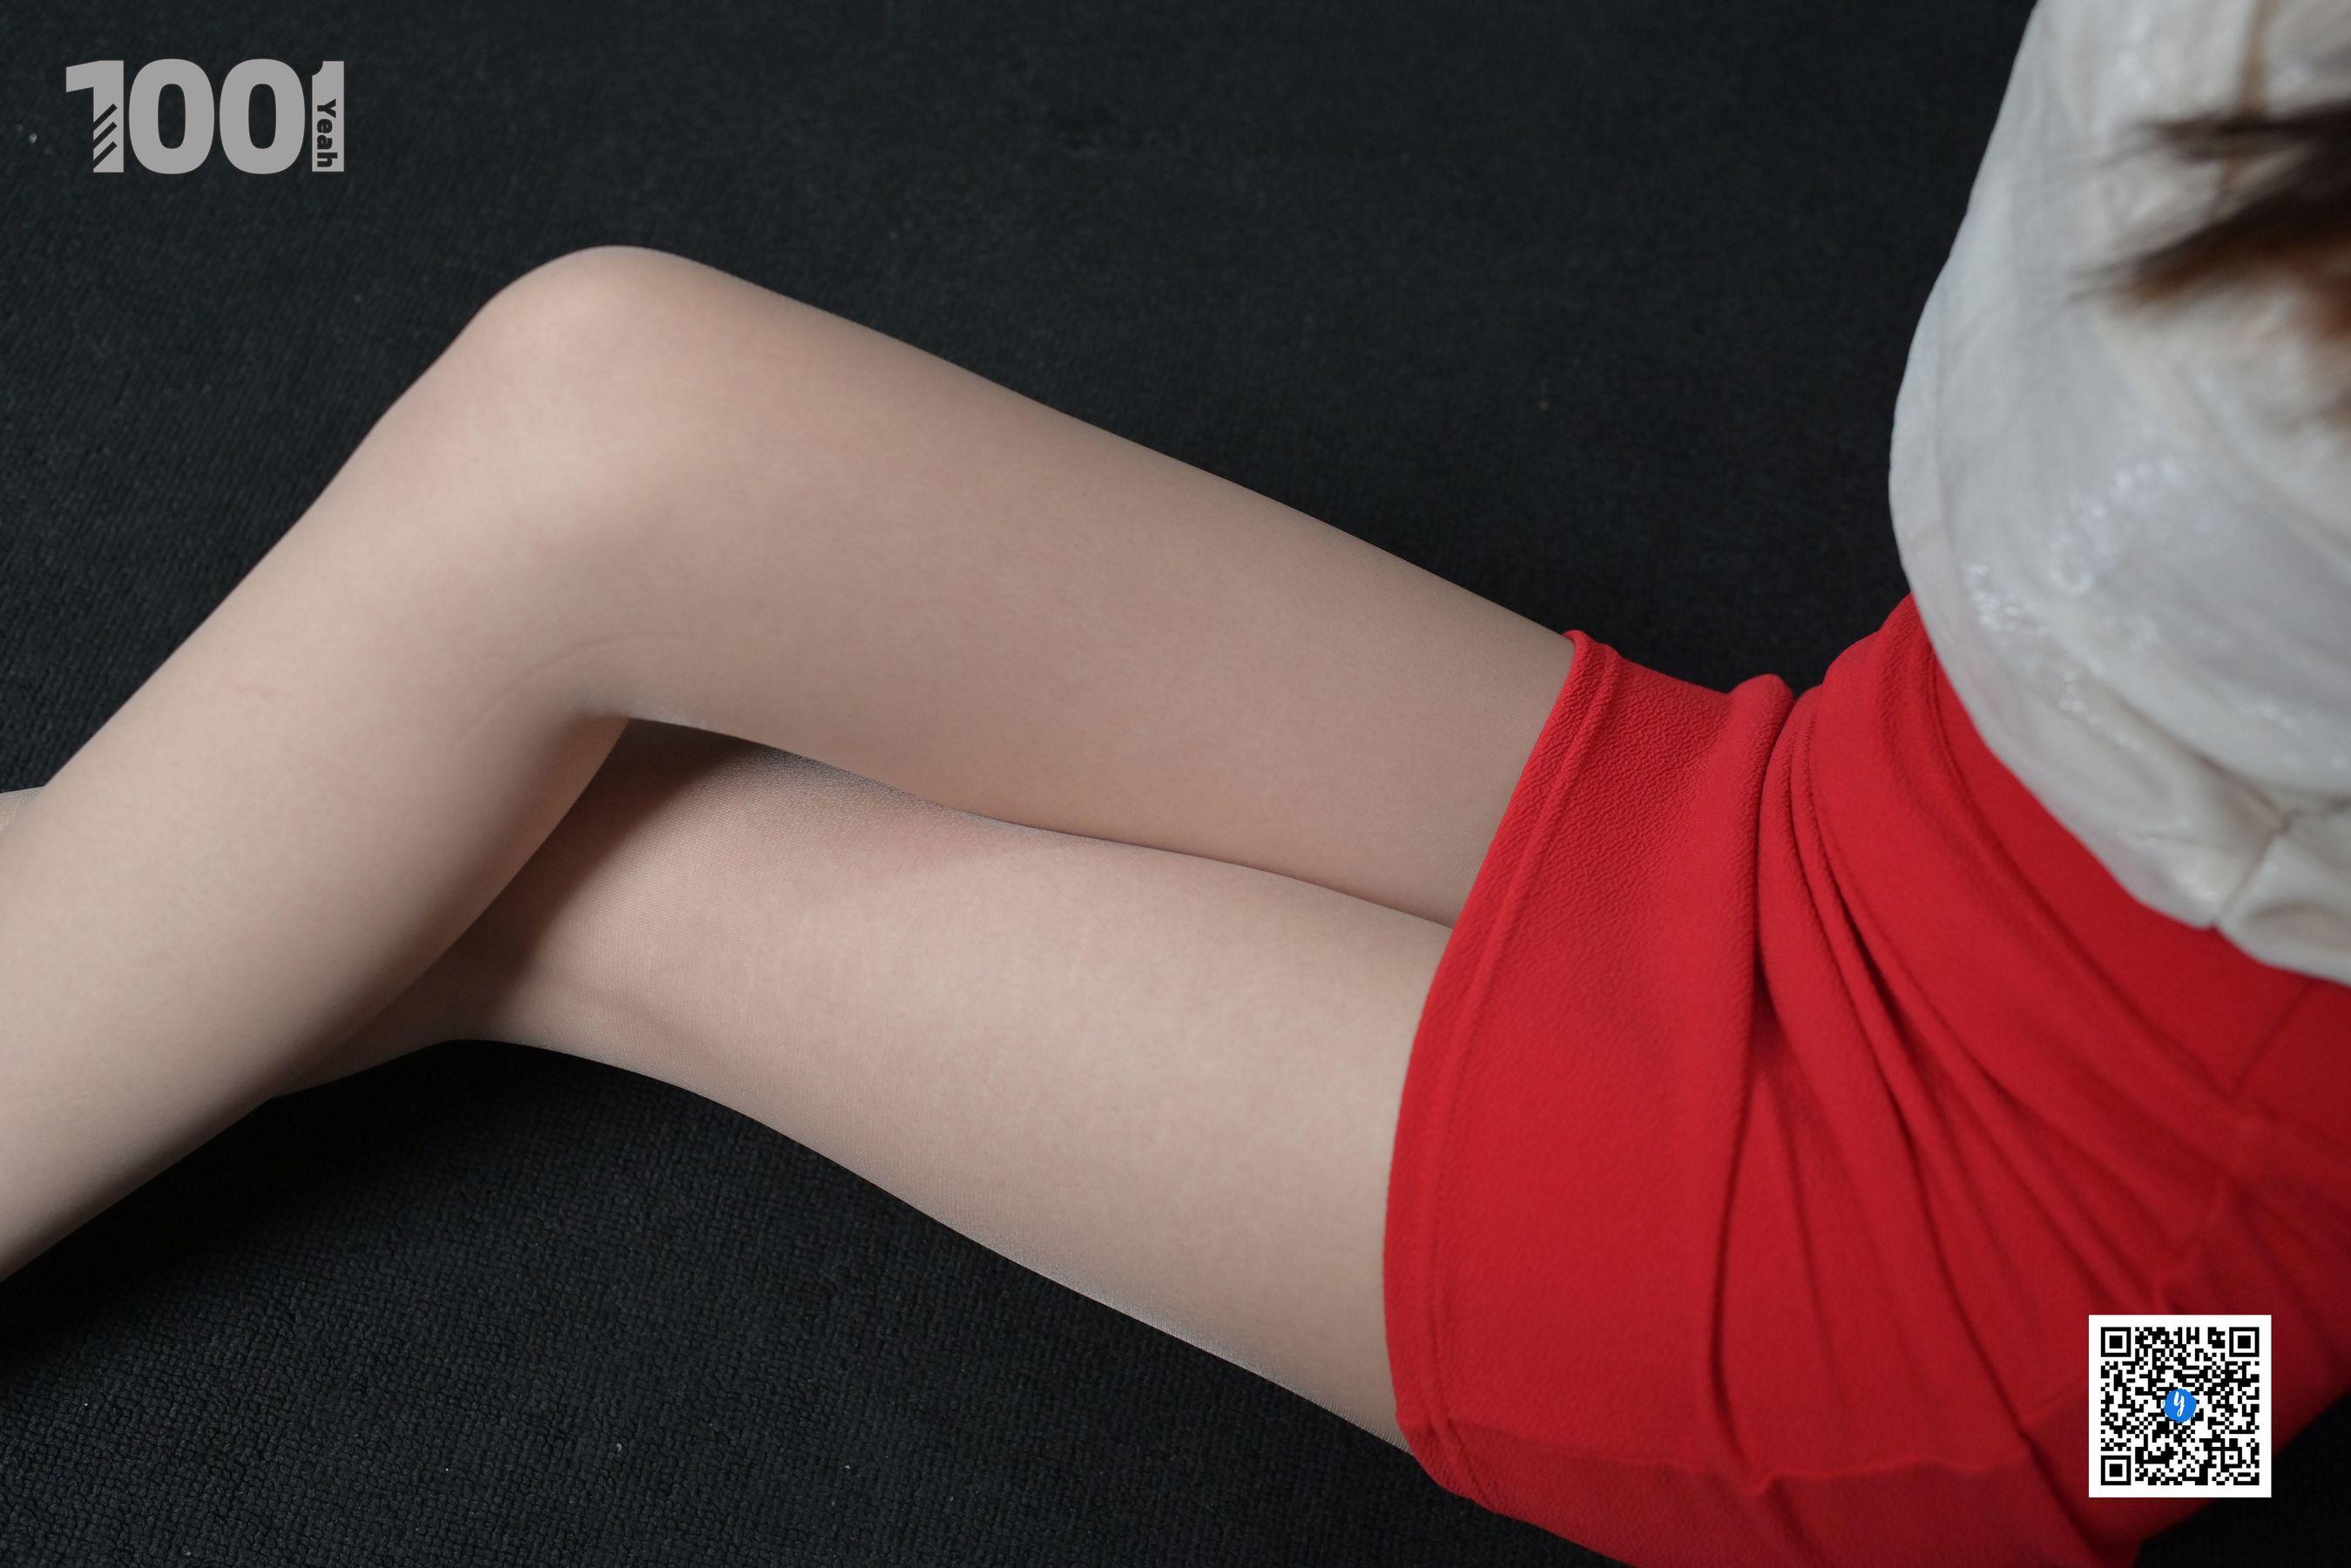 [IESS] NO.190 【一抹红】完结篇  丝足美腿写真[90P]插图(1)